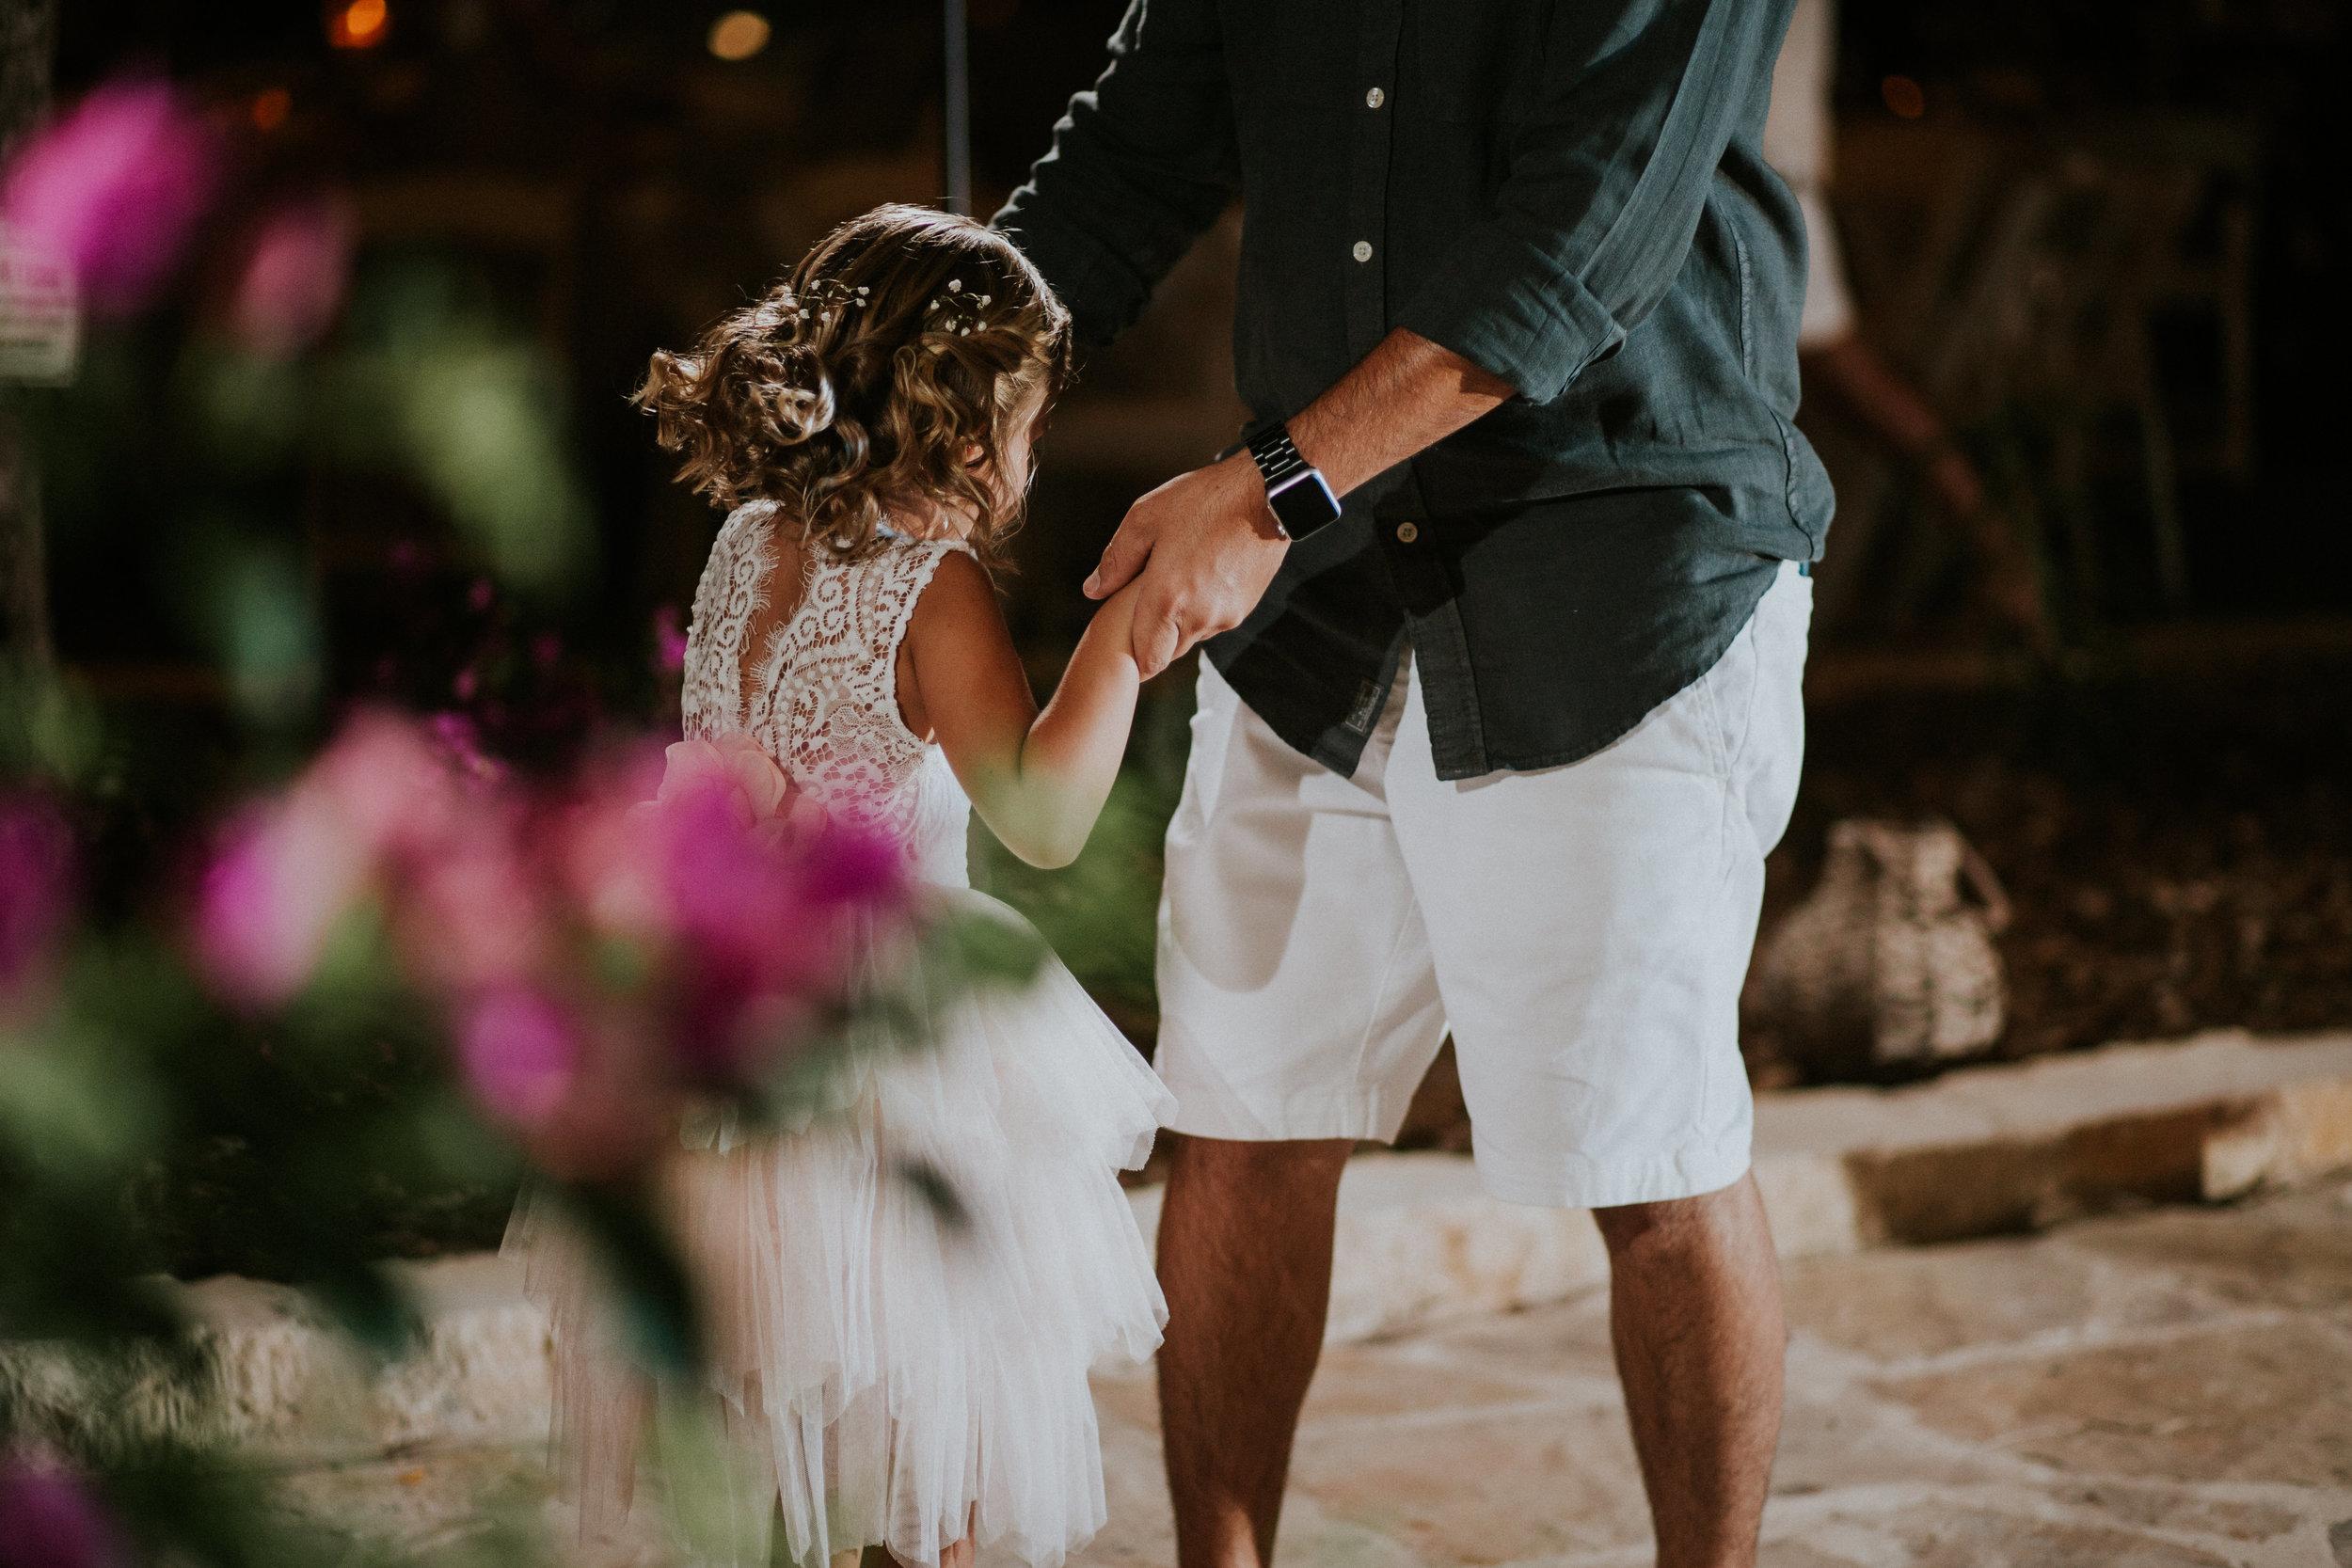 Family-Friendly Wedding Venue